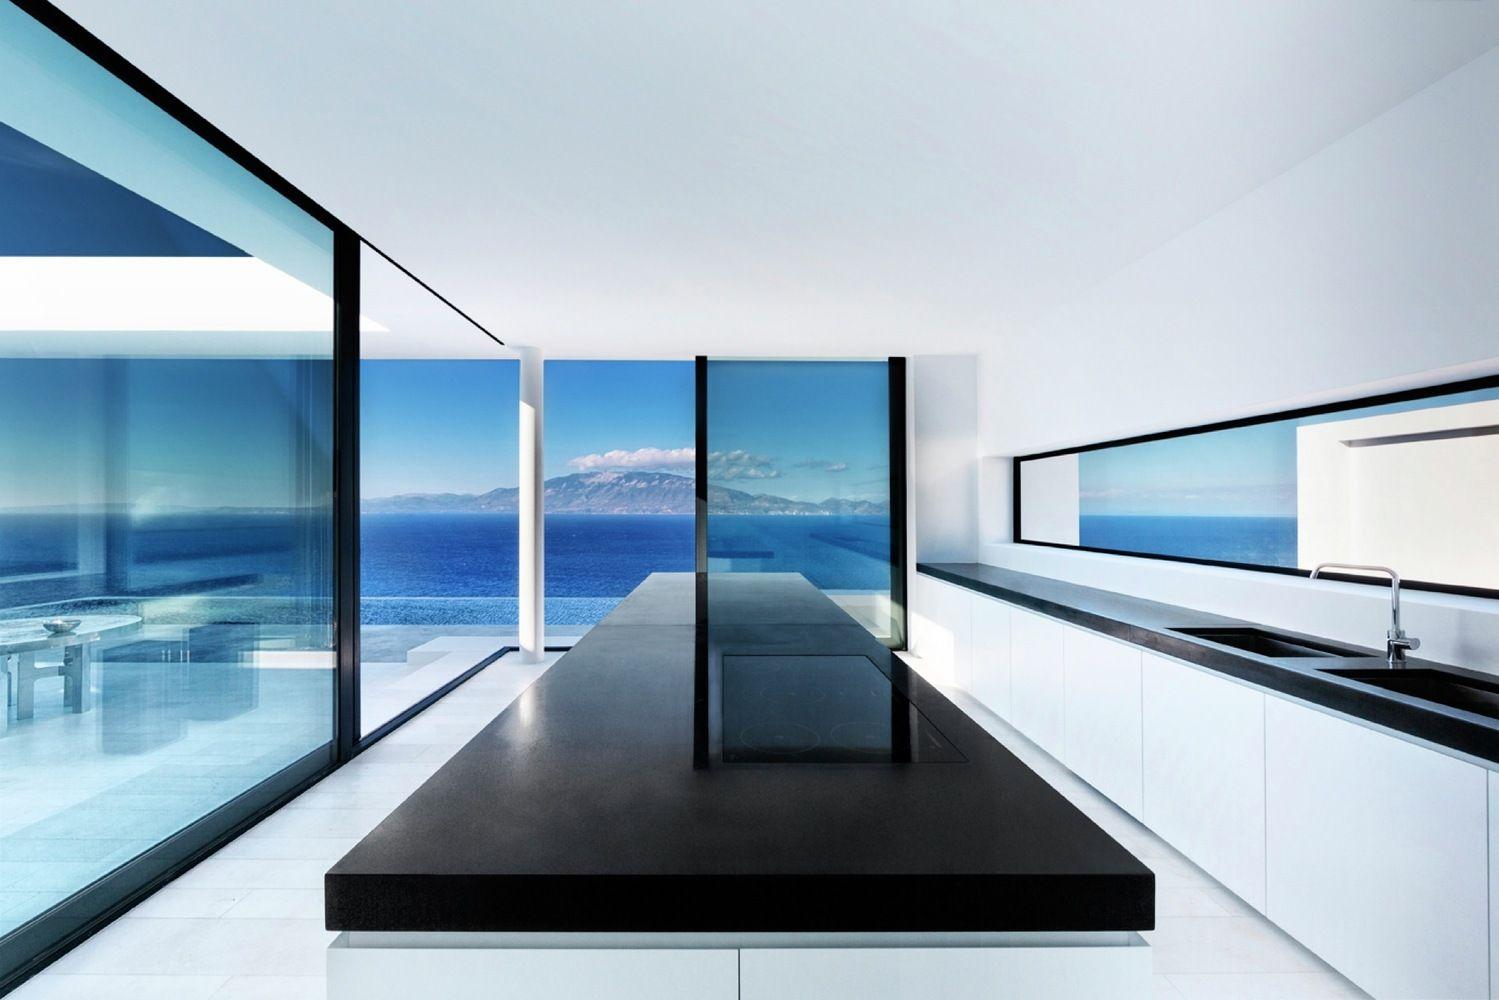 Galer a de la casa de plata dwek architectes 5 for Casas de diseno grafico en la plata